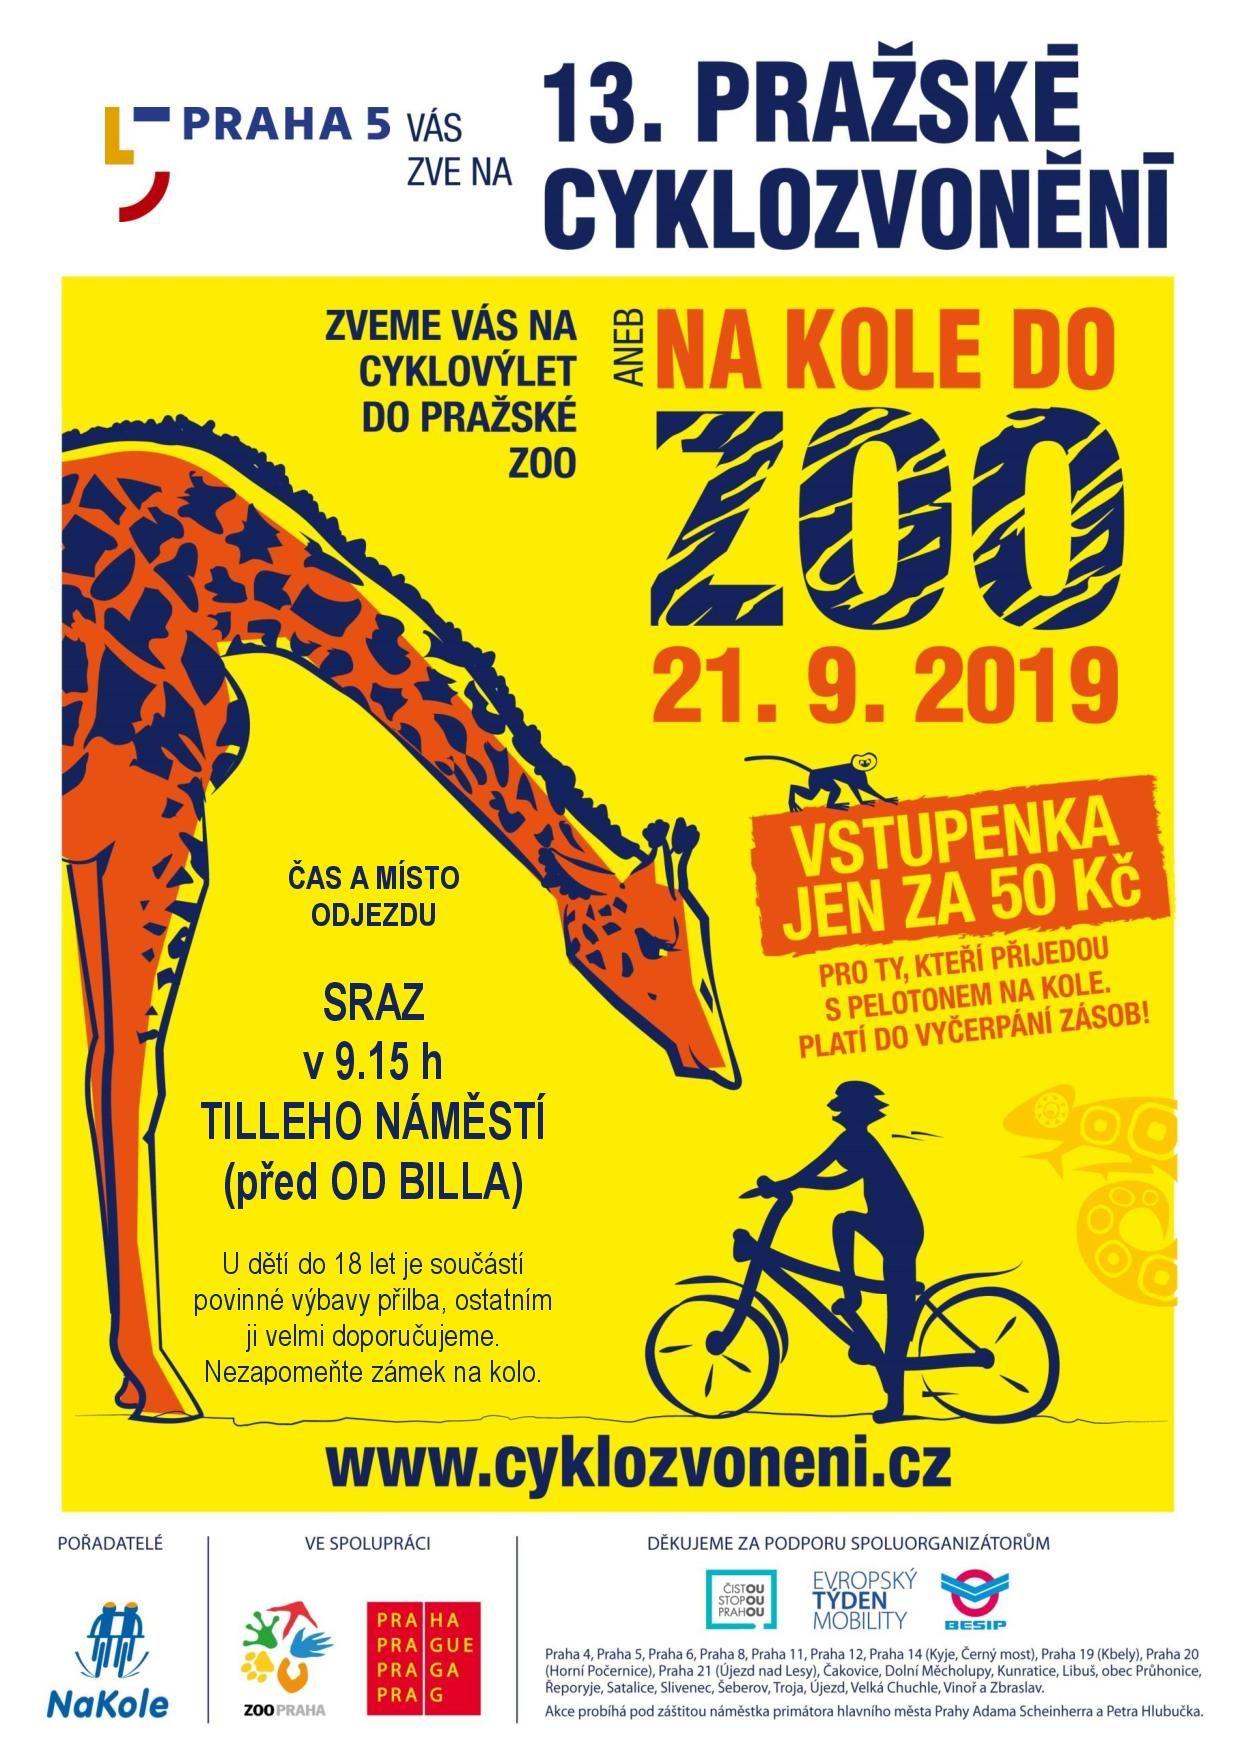 13-rocnik-prazskeho-cyklozvoneni-aneb-na-kole-do-zoo